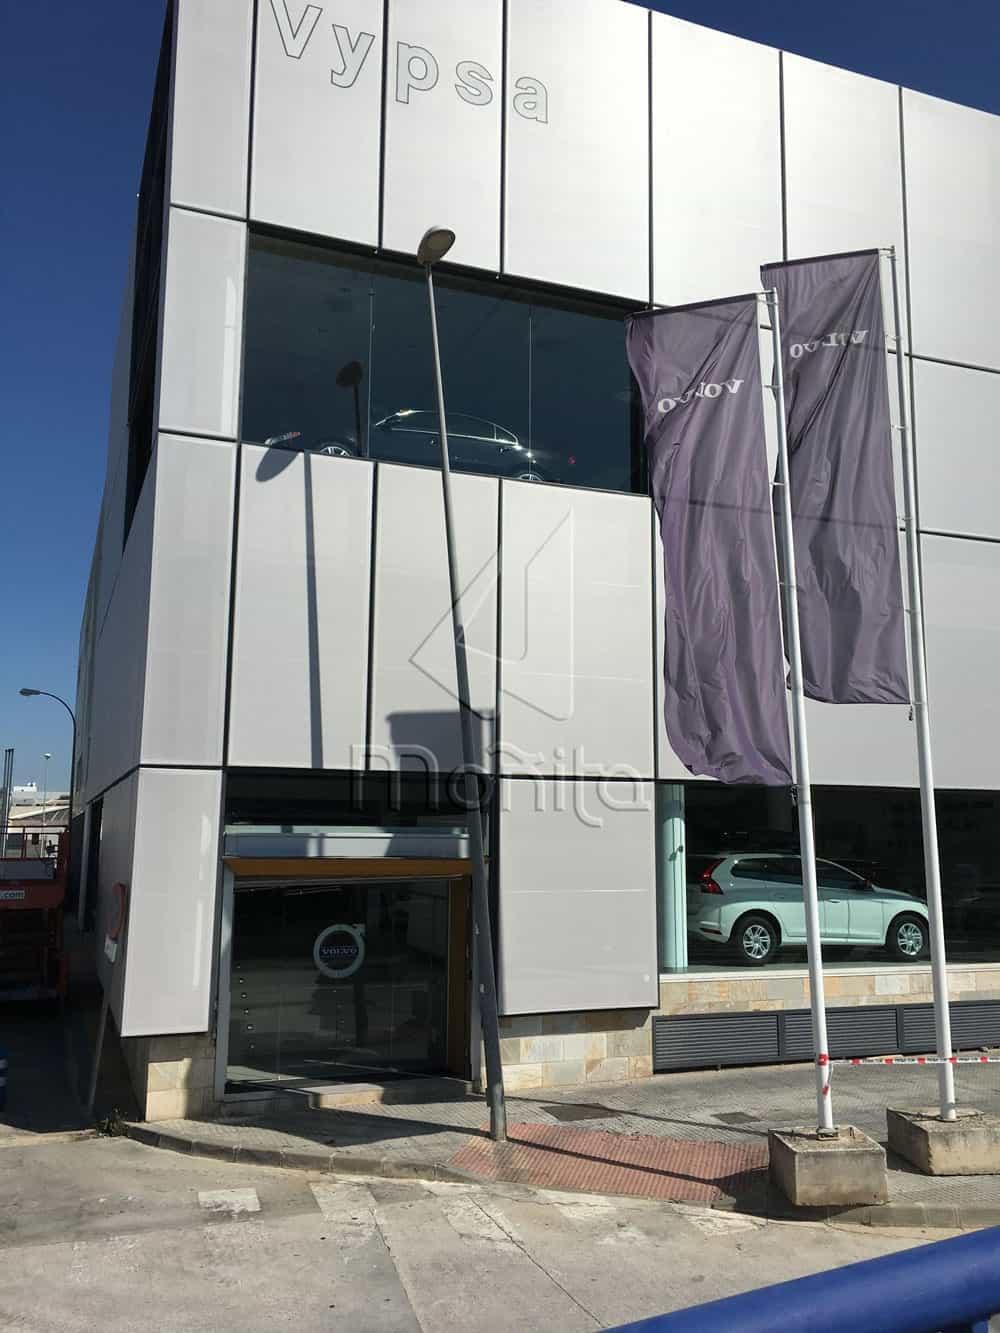 fMOÑITA fachada textil concesionario